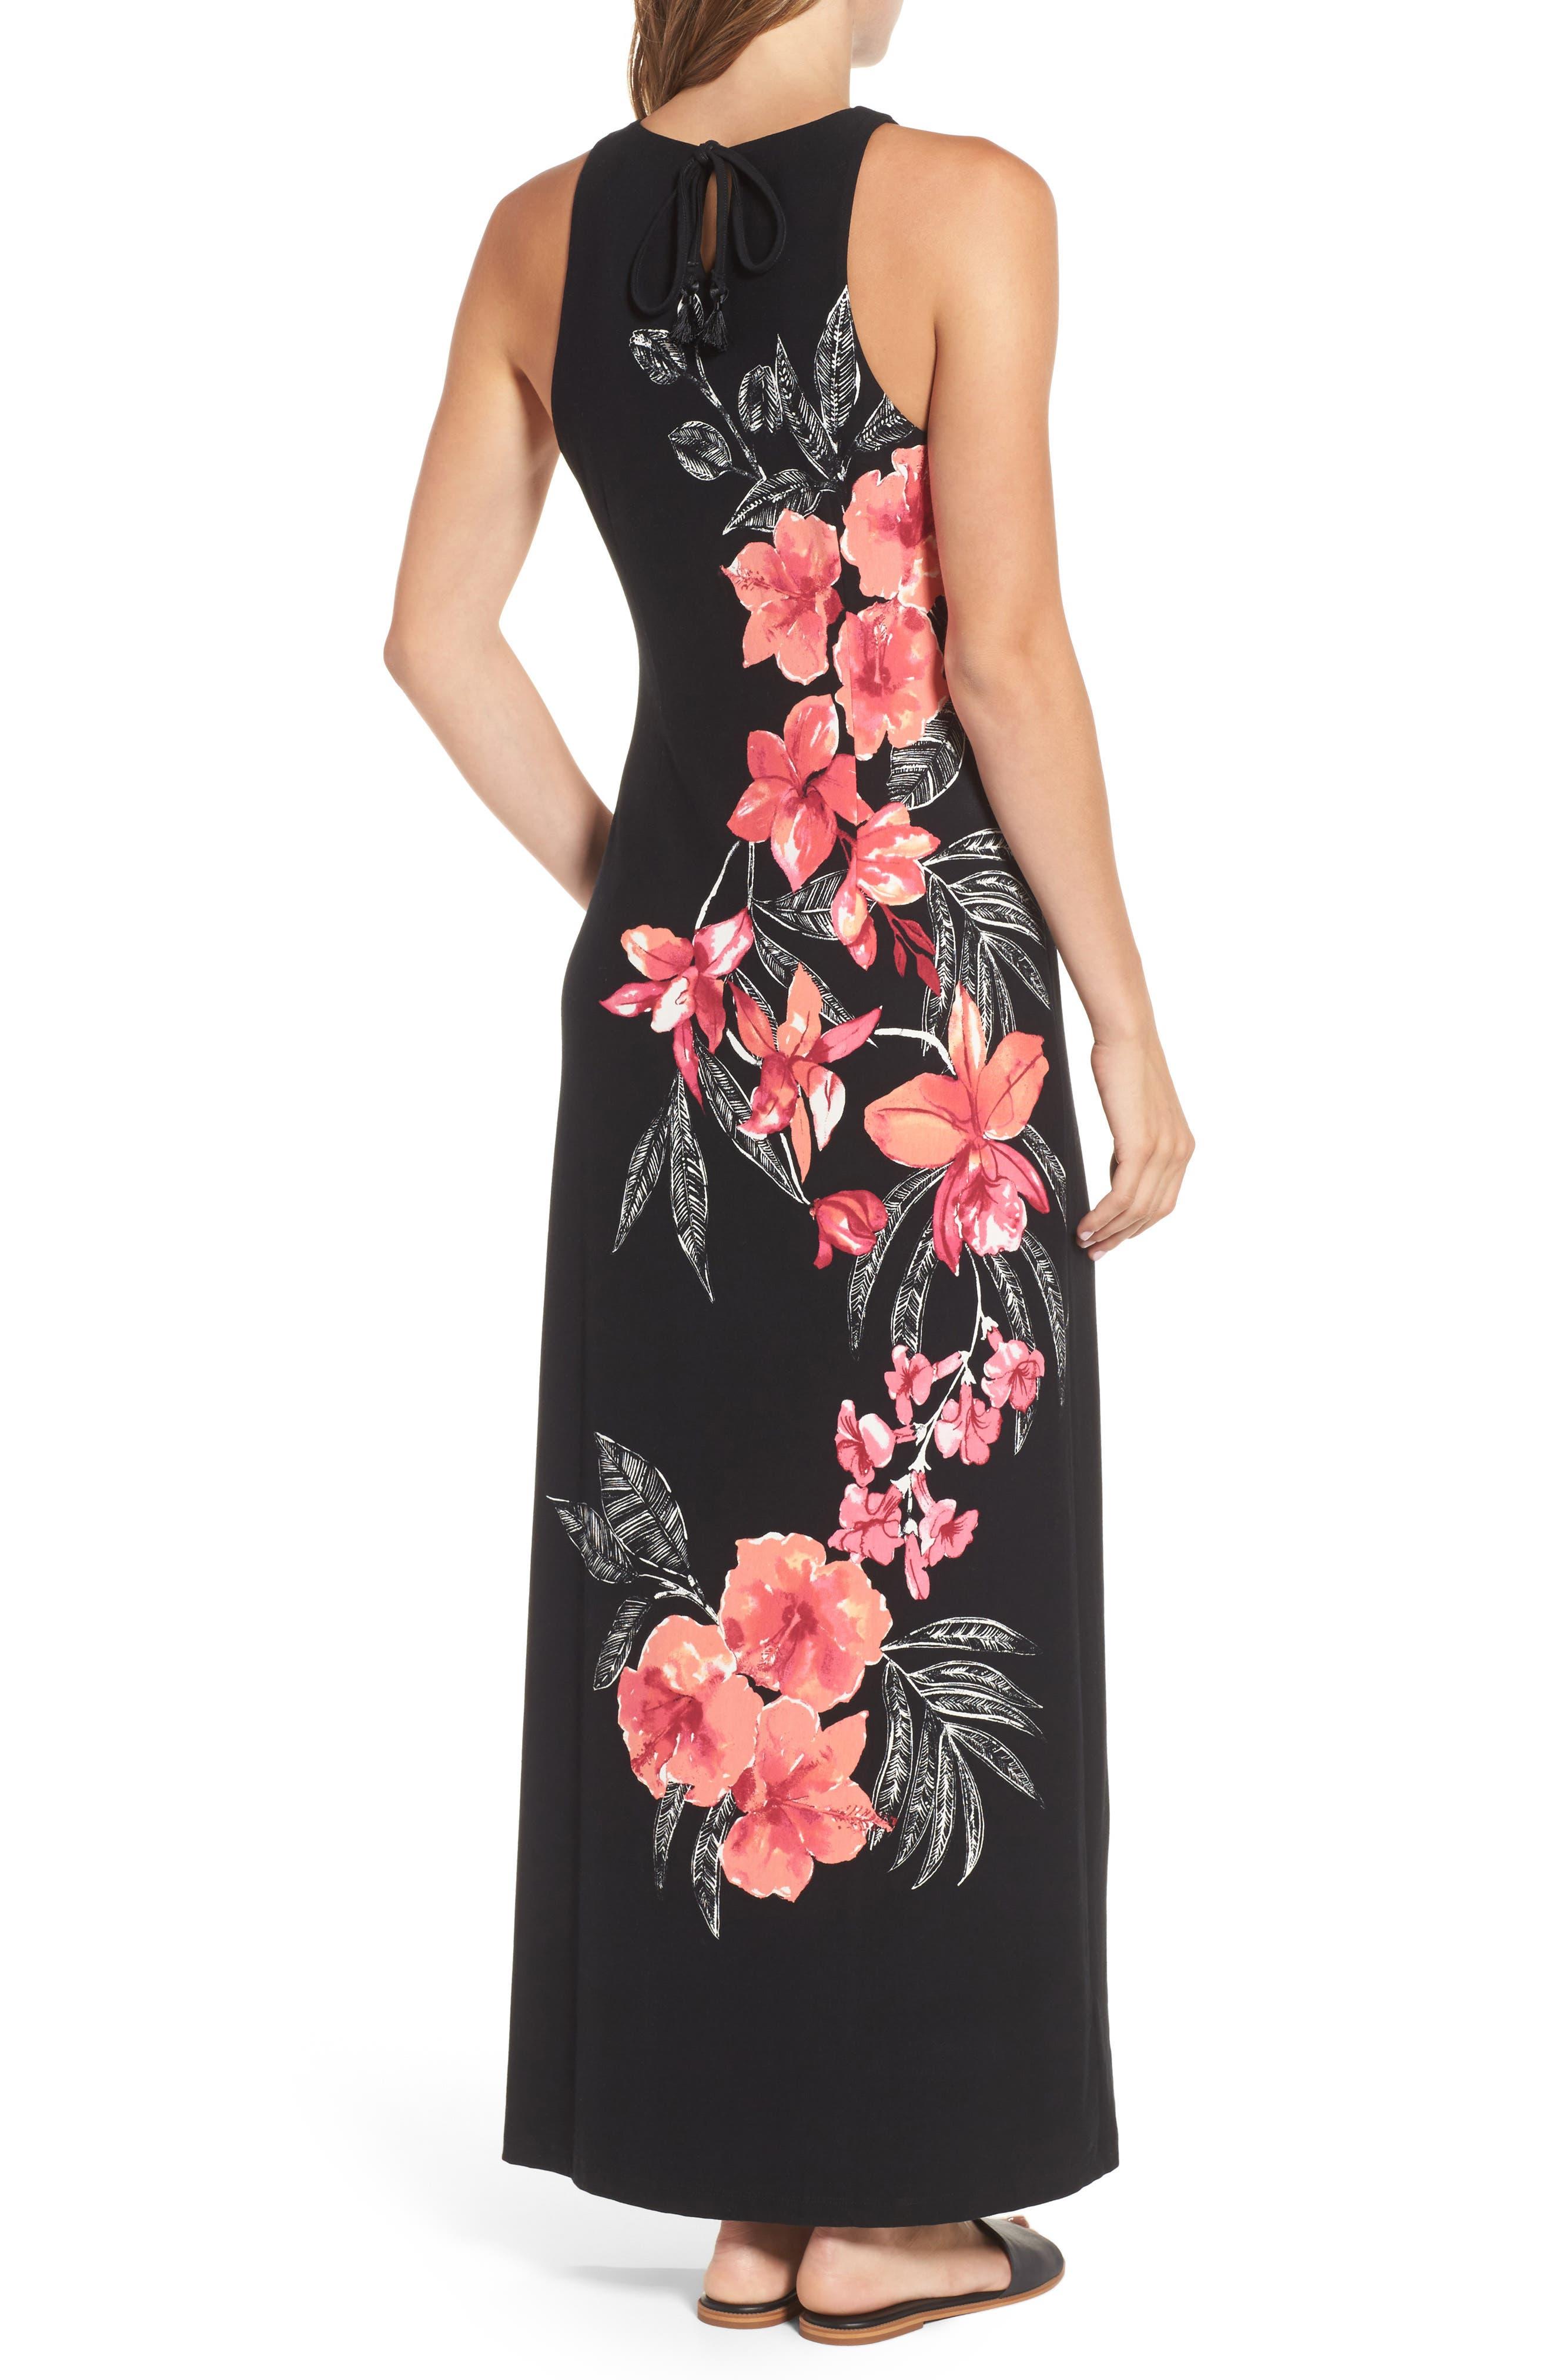 Bedoin Blossoms Maxi Dress,                             Alternate thumbnail 2, color,                             001